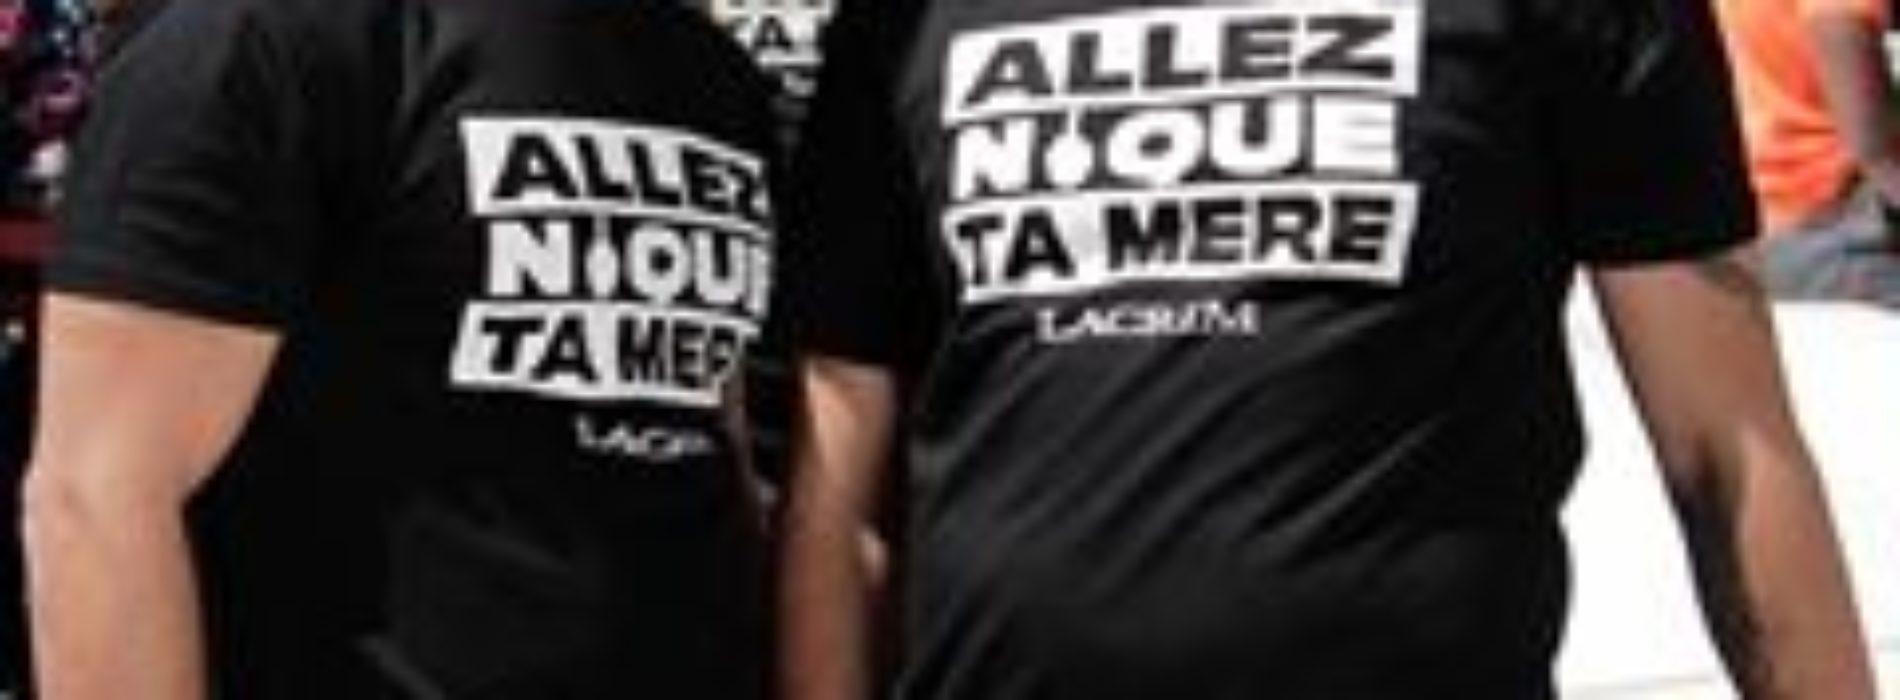 Lacrim – Allez n**** ta mère ft. Soso Maness – Juin 2020